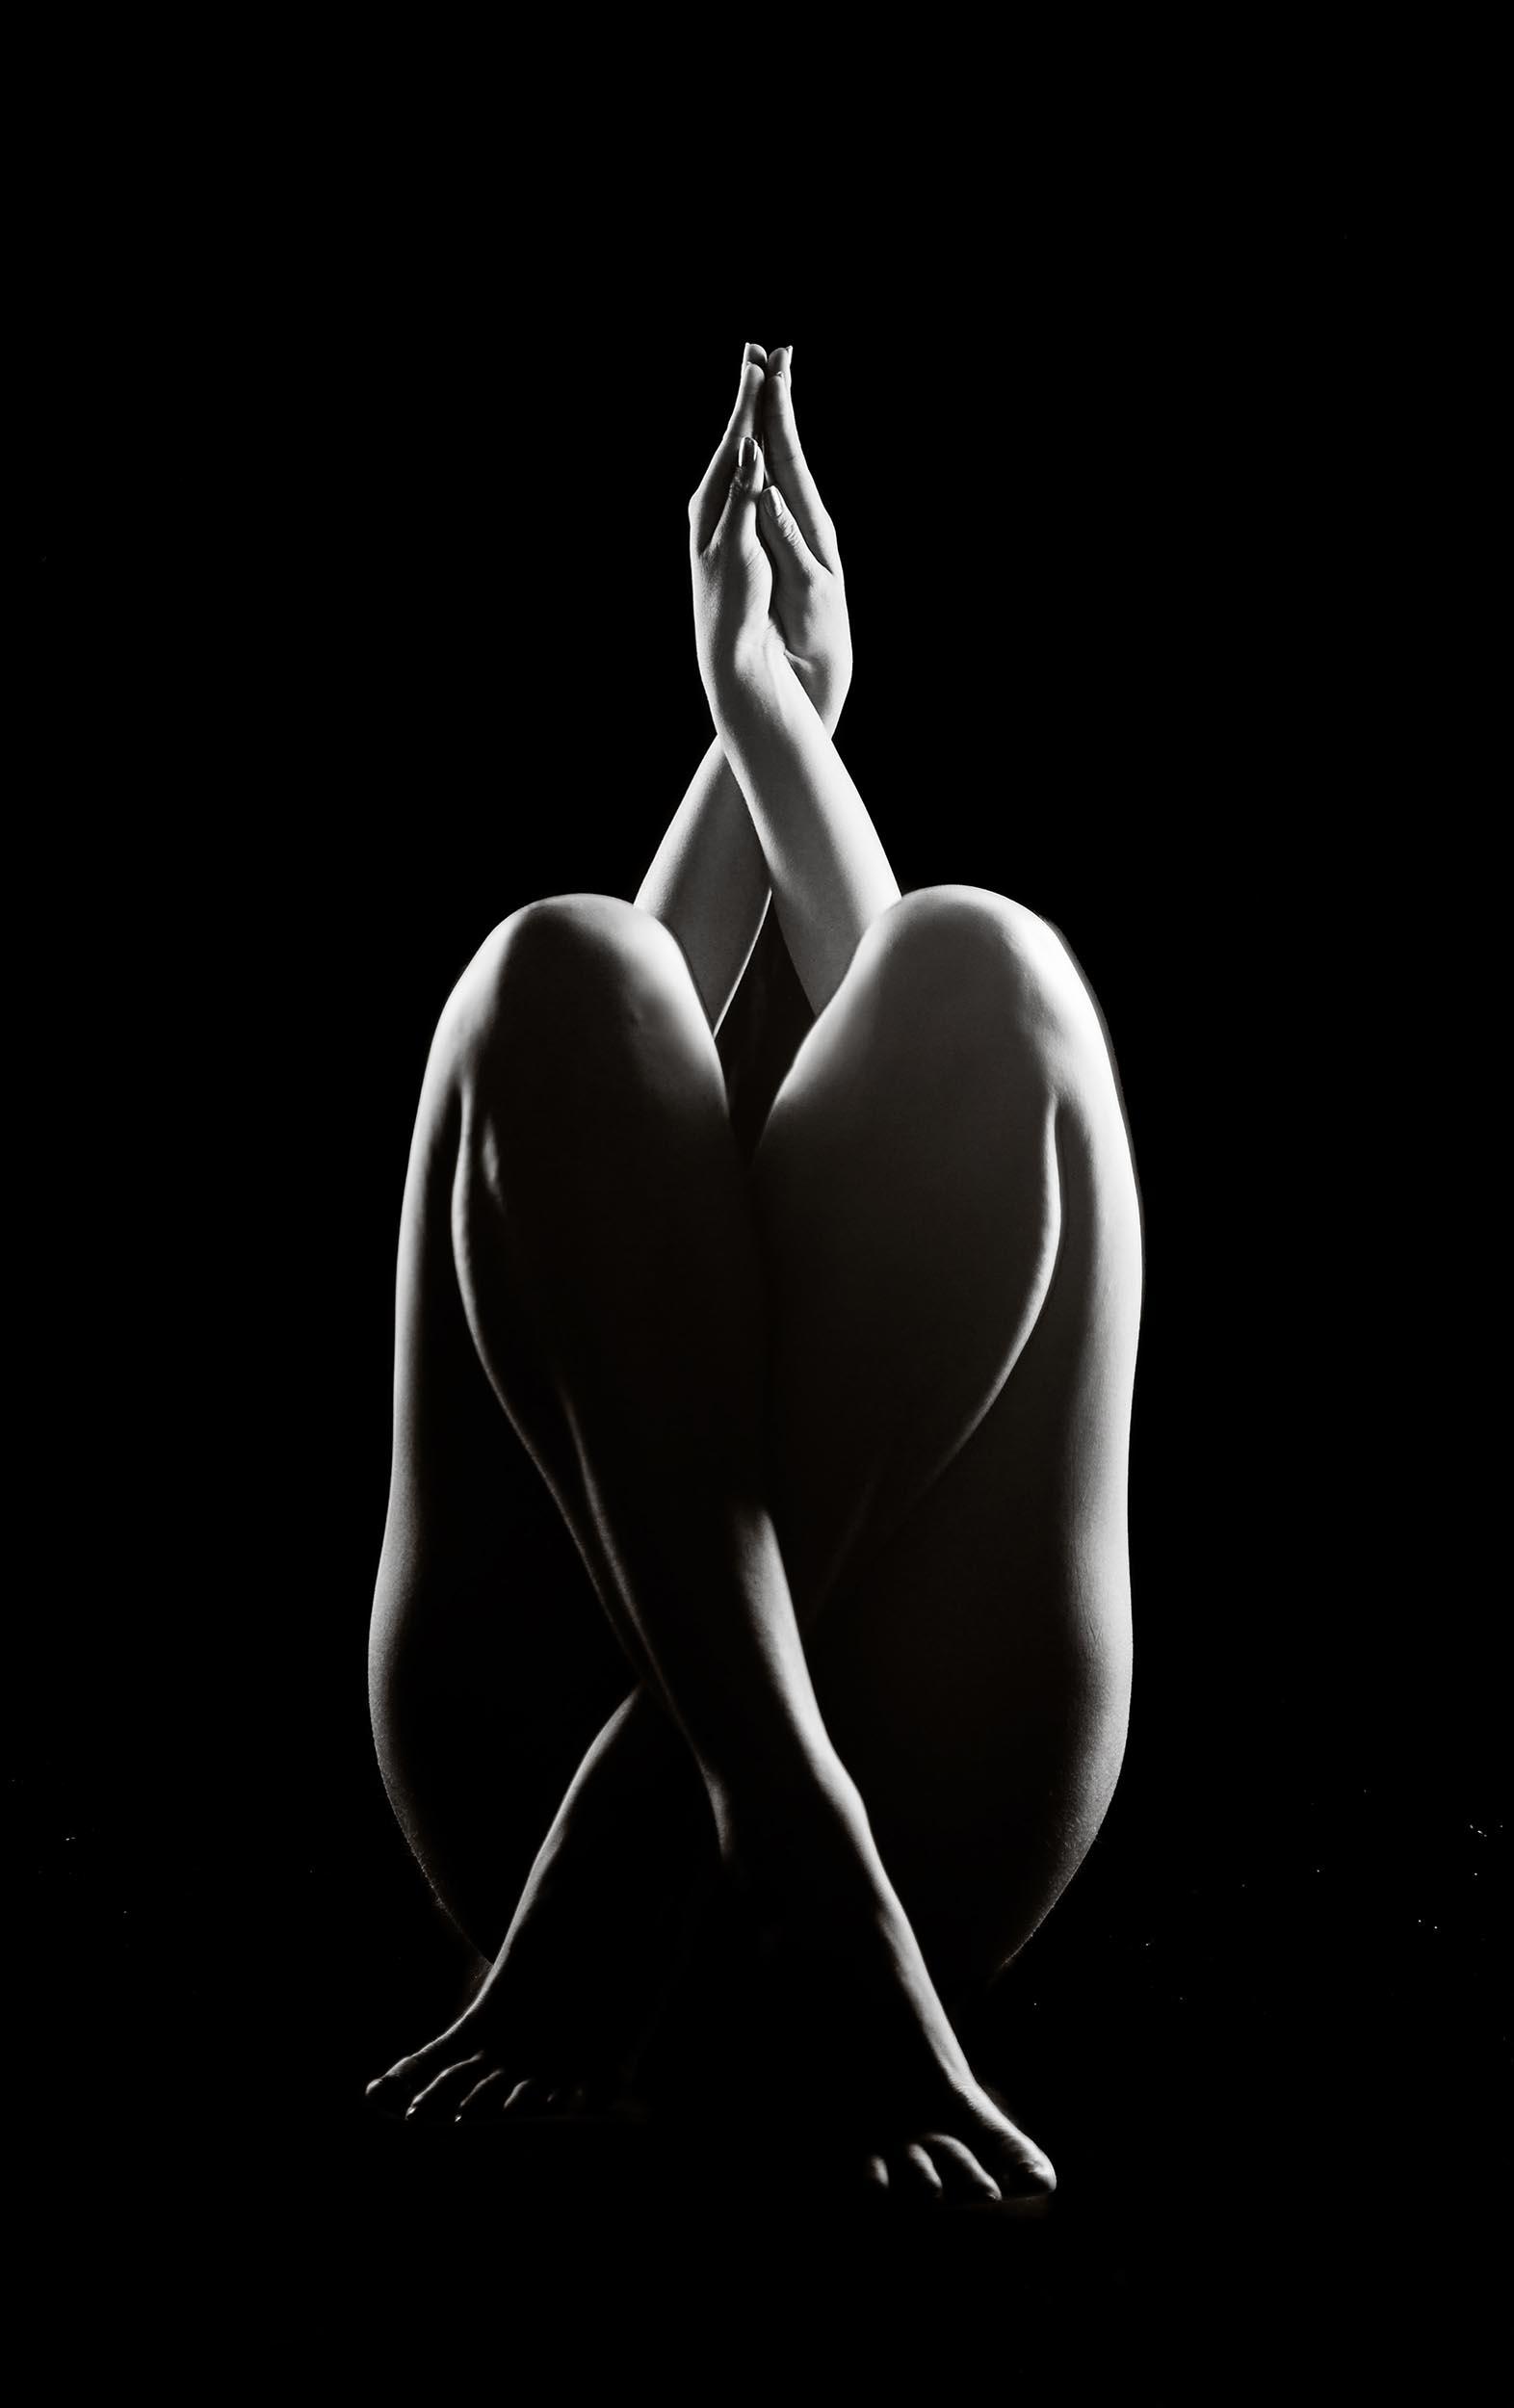 Yoga T.Sedore photography